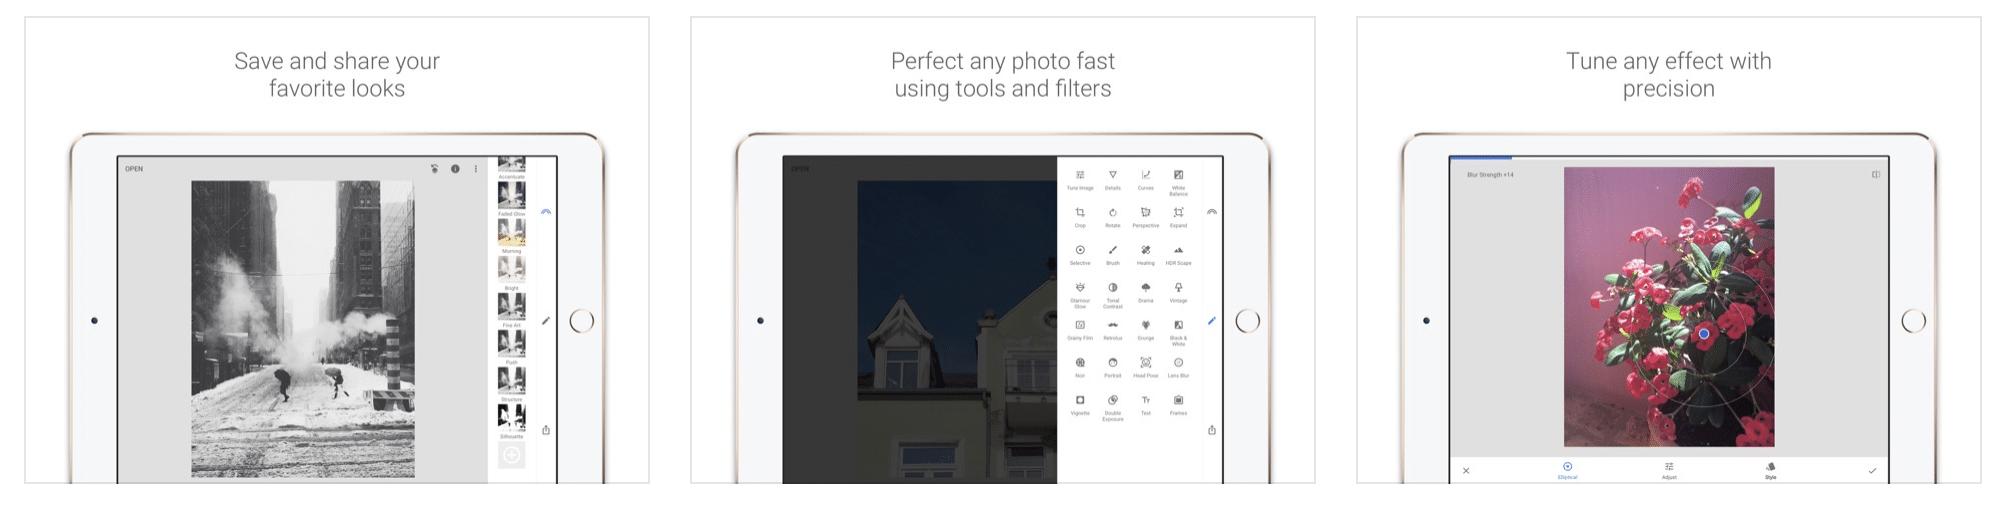 Snapseed JPG and RAW files photo editing app